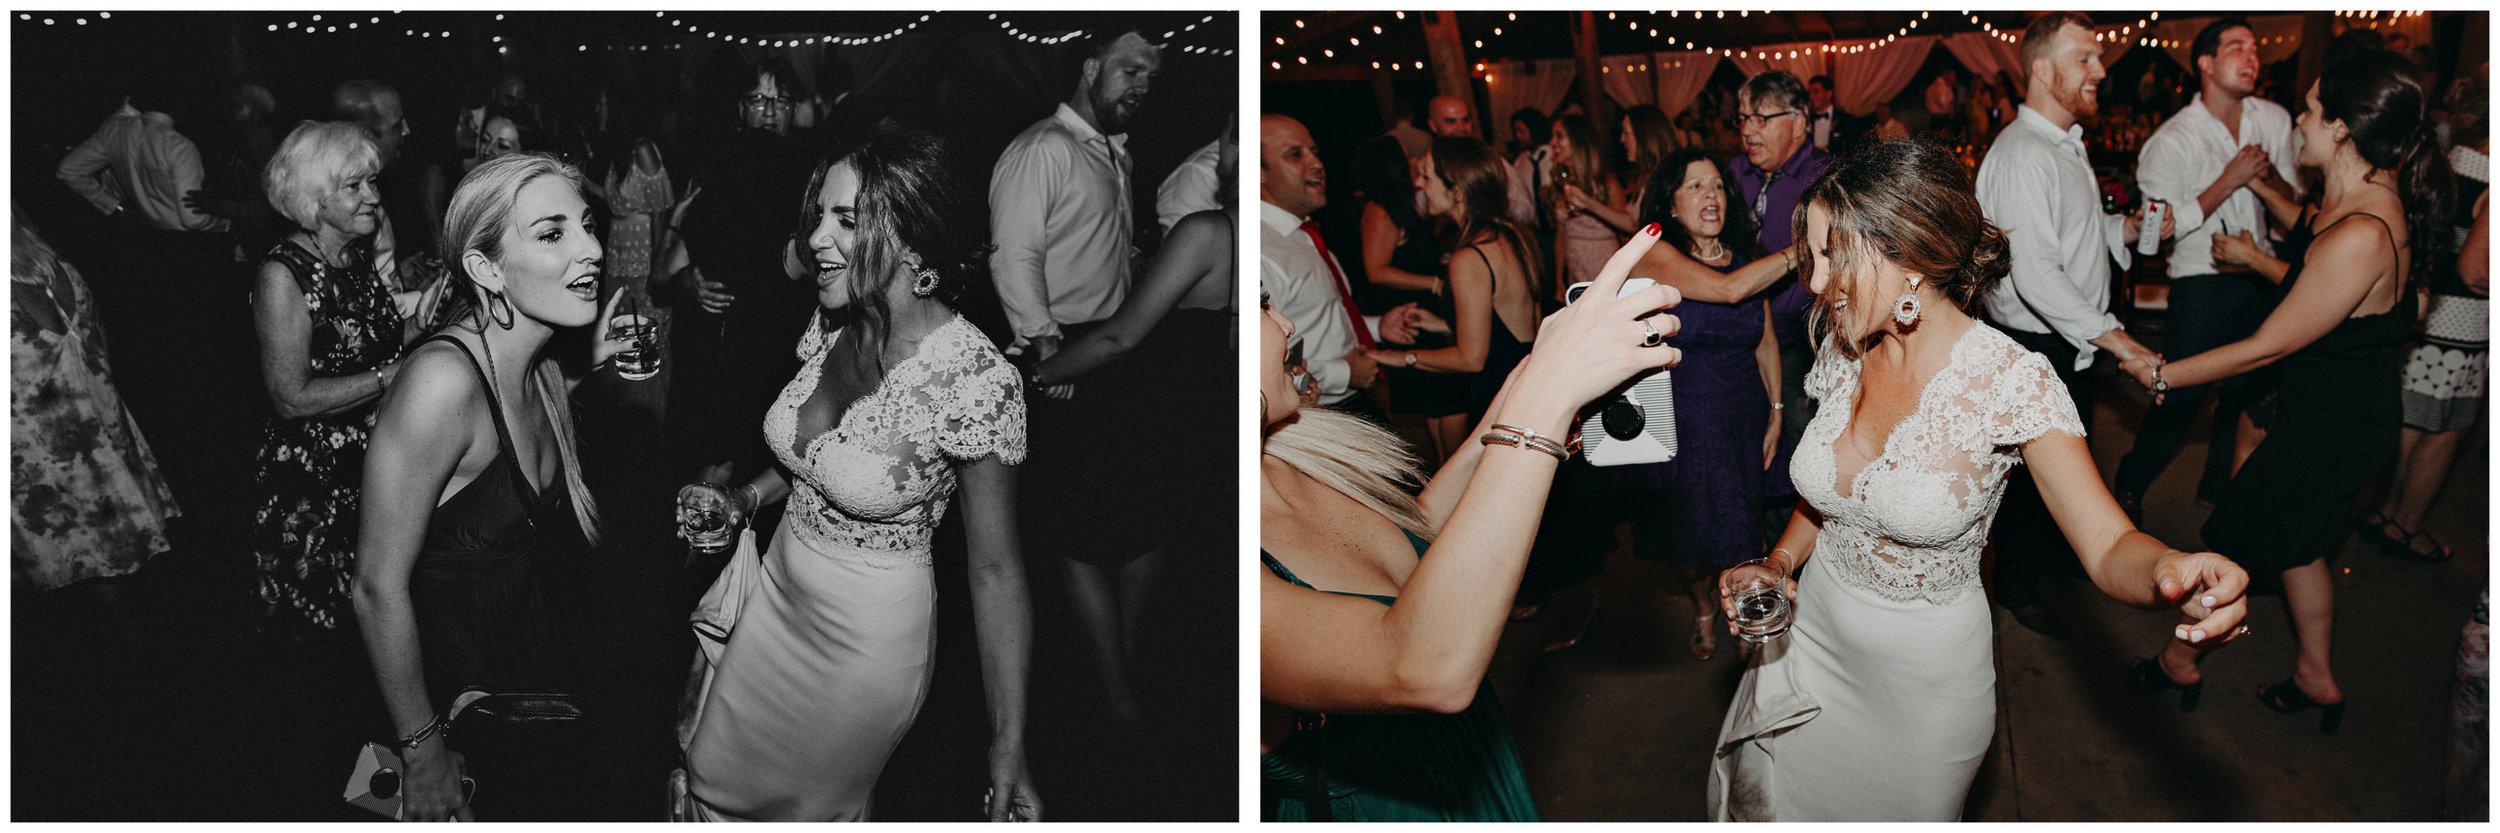 142 - Fun Wedding Reception at serenbi farms atlanta .jpg